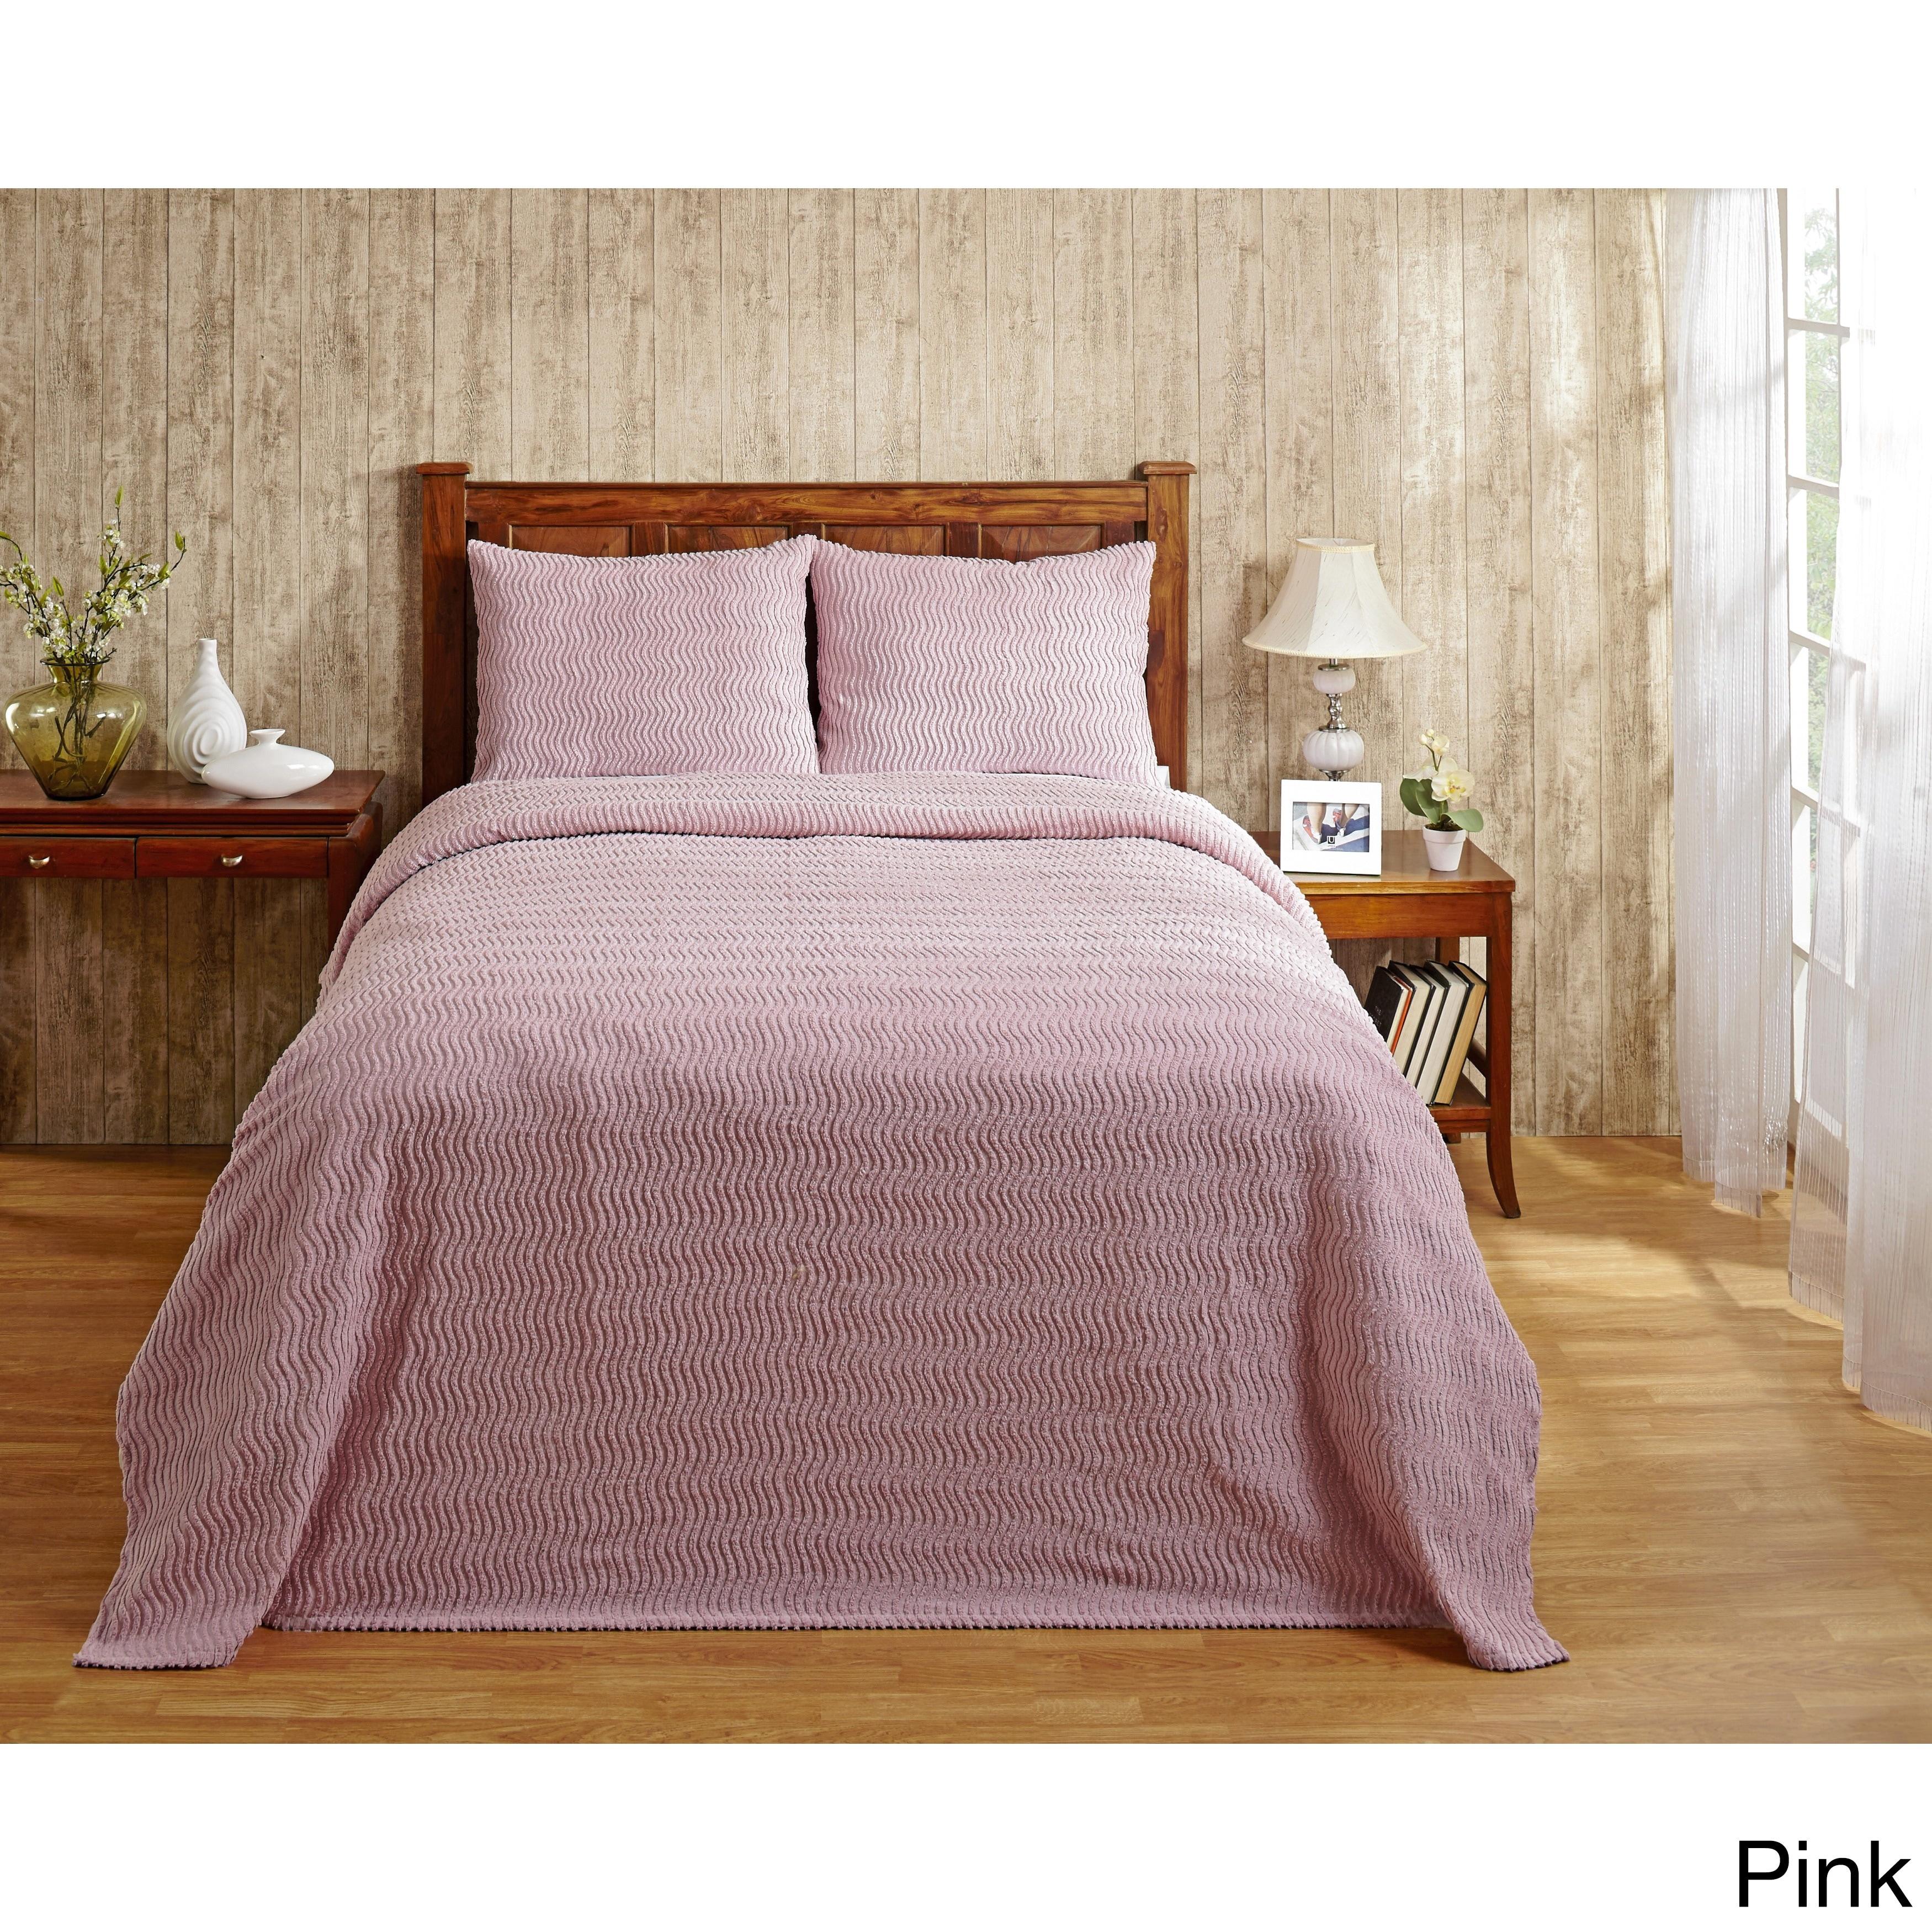 bedding bellamy comforter gray set p silver tufted